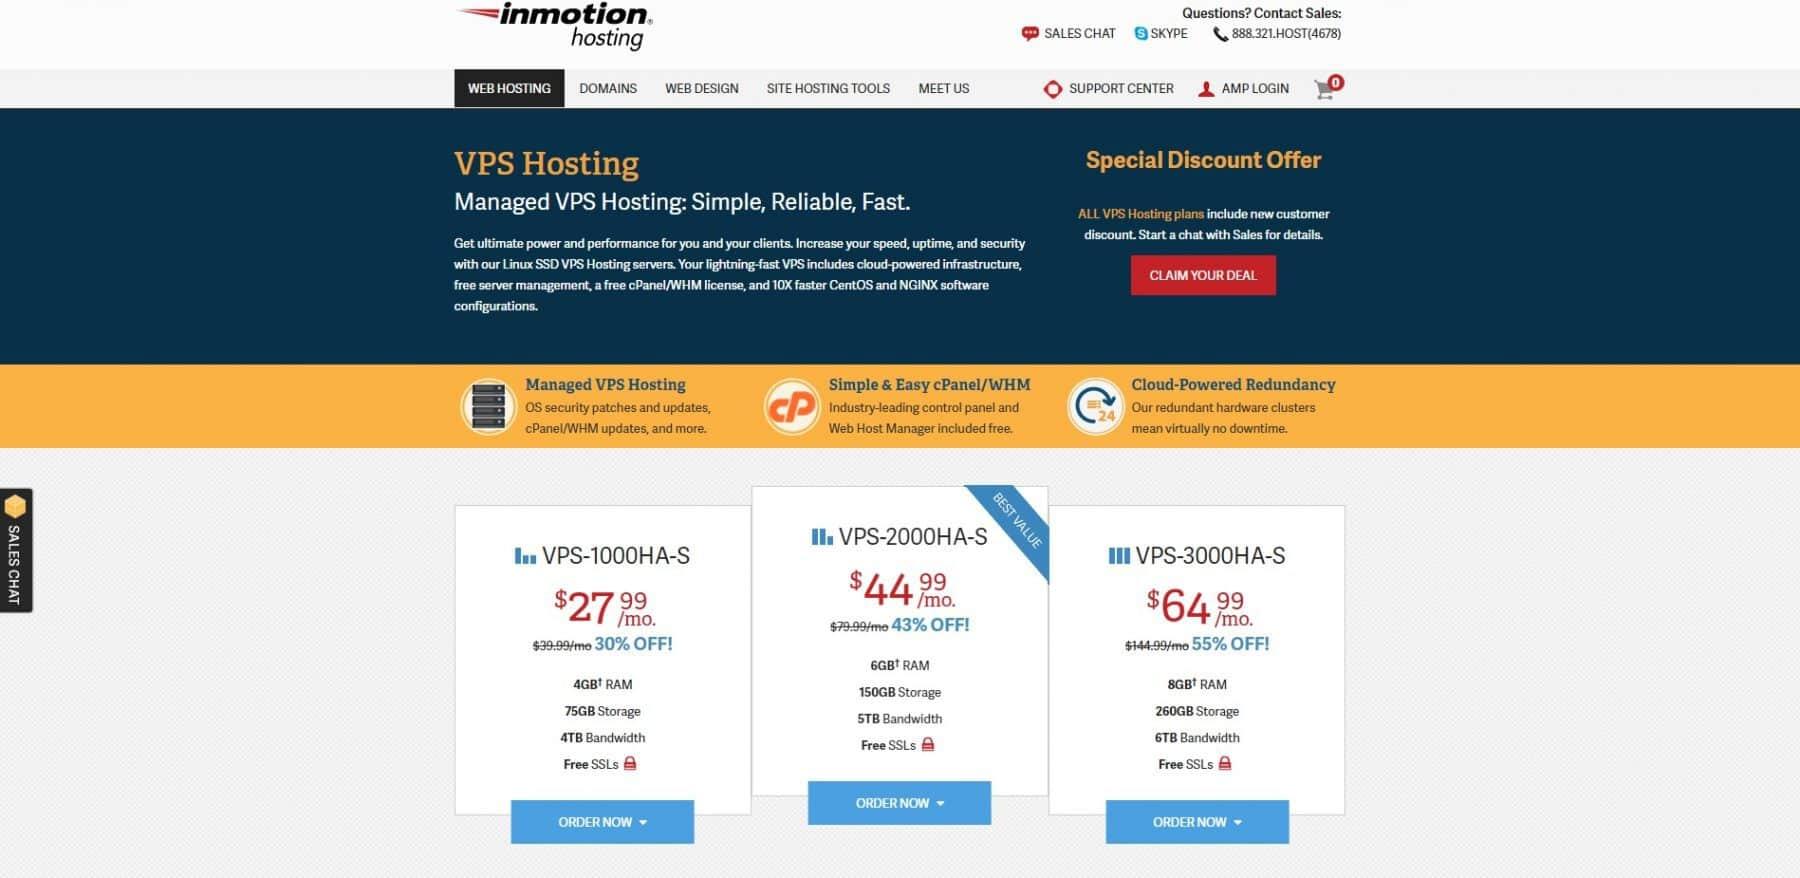 inmotion hosting managed vps hosting